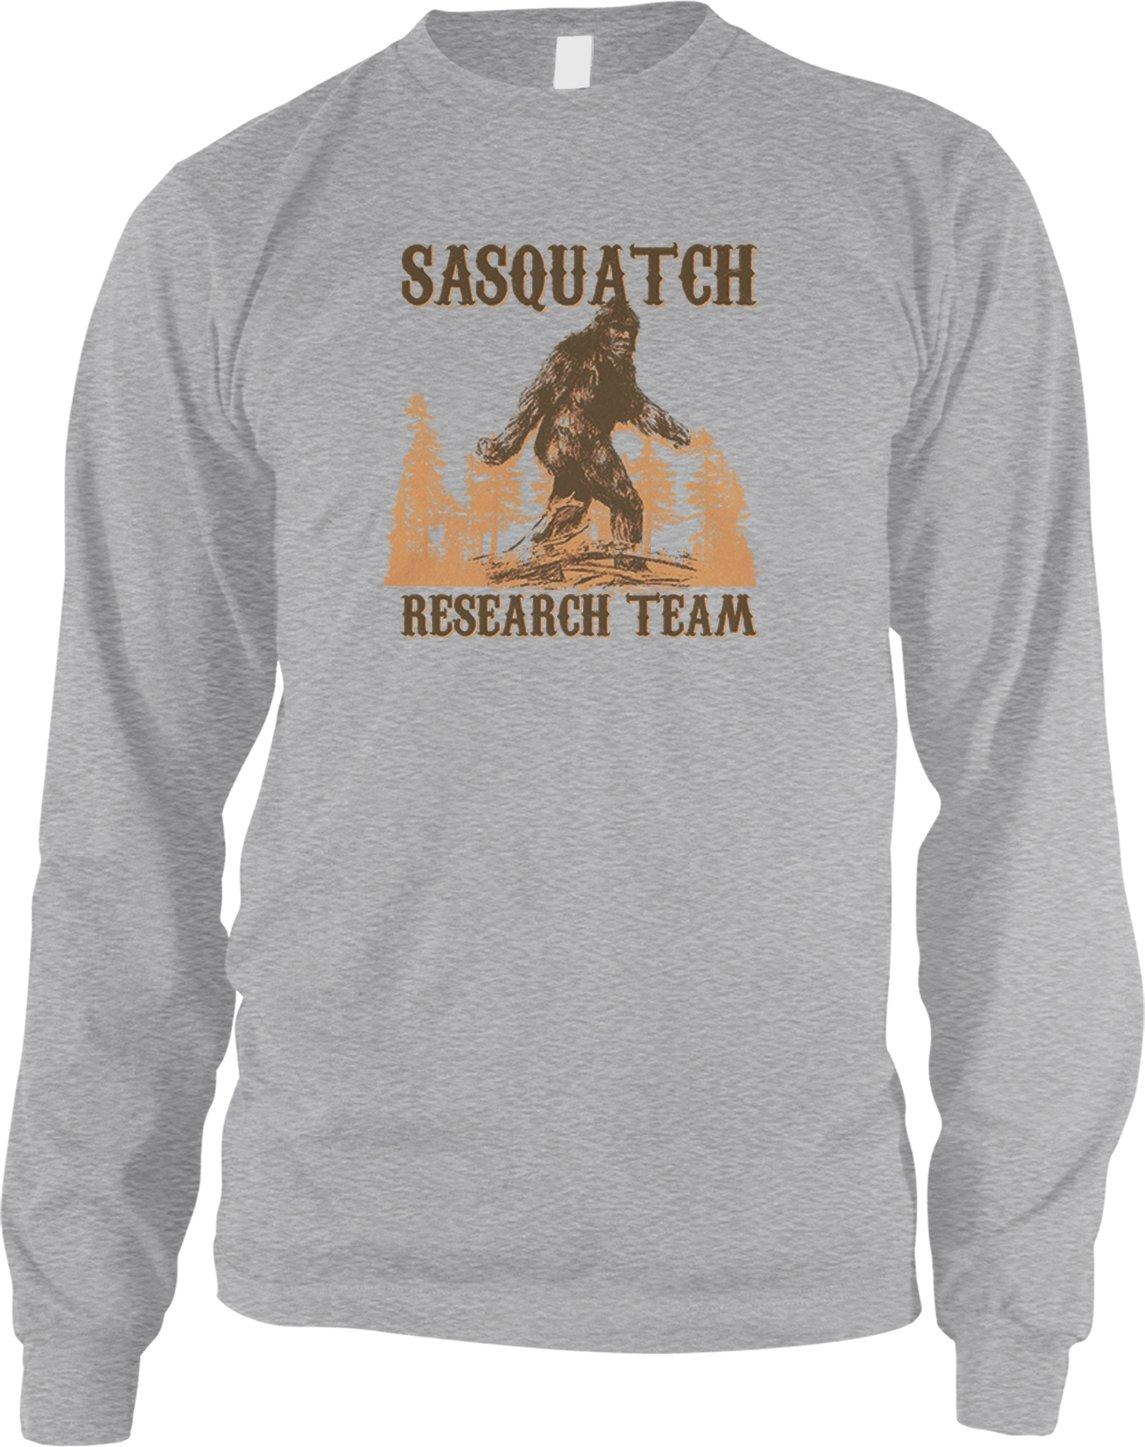 Sasquatch Research Team Shirts